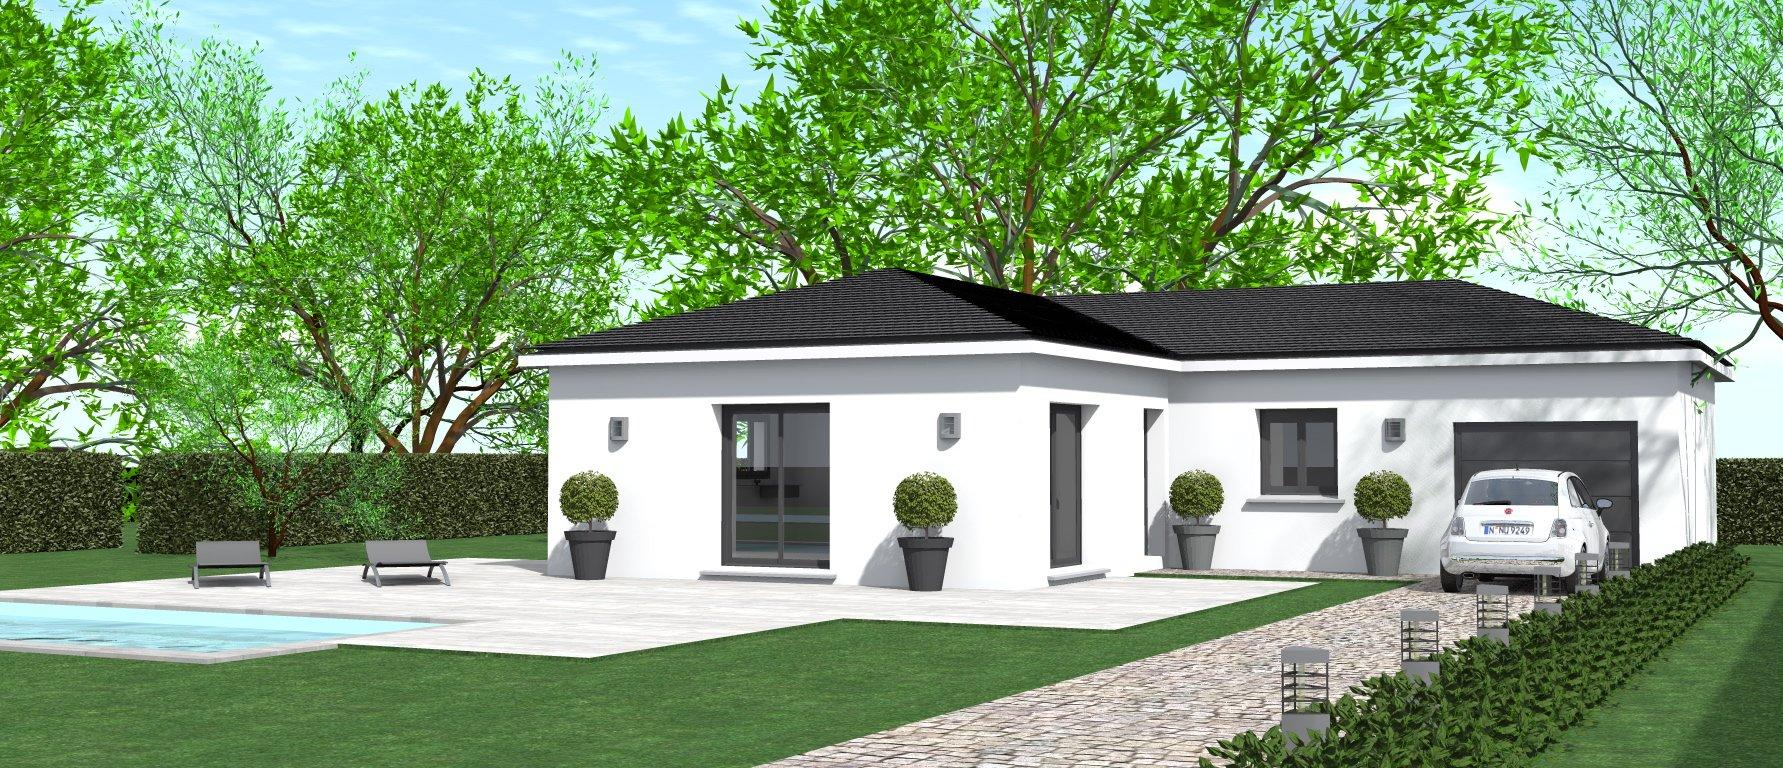 Maisons du constructeur HOME GROUP CONSEILS • 80 m² • ASSIEU